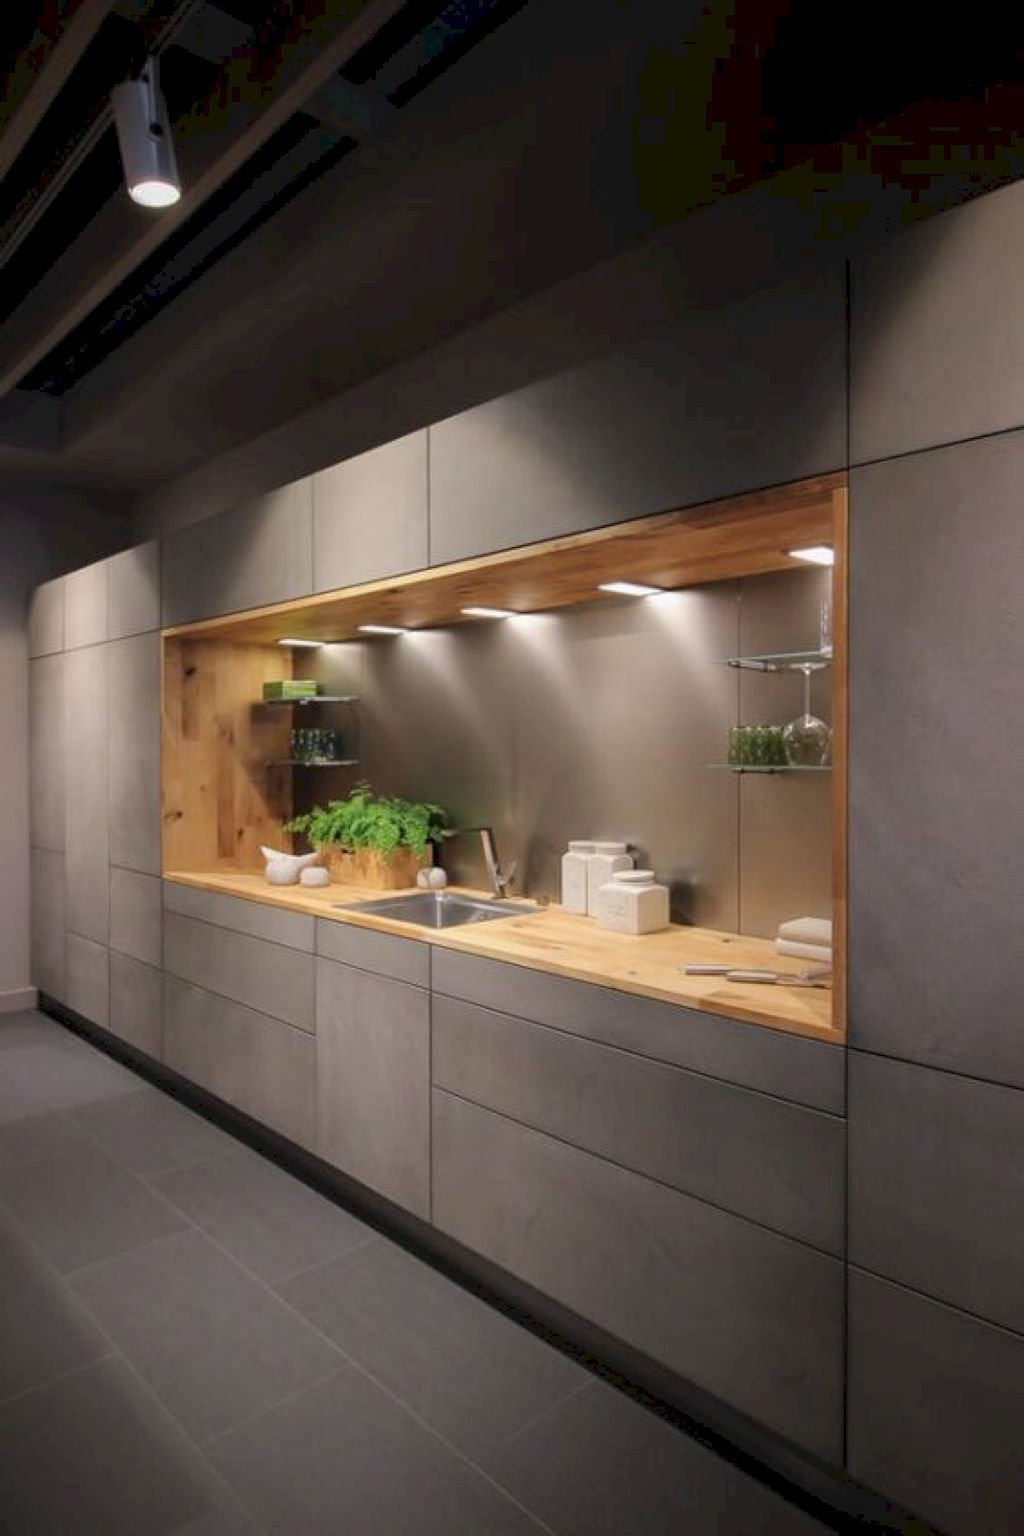 1052 Best Interior Design Images On Pinterest: 85 Modern Kitchen Cabinetry Decor Ideas